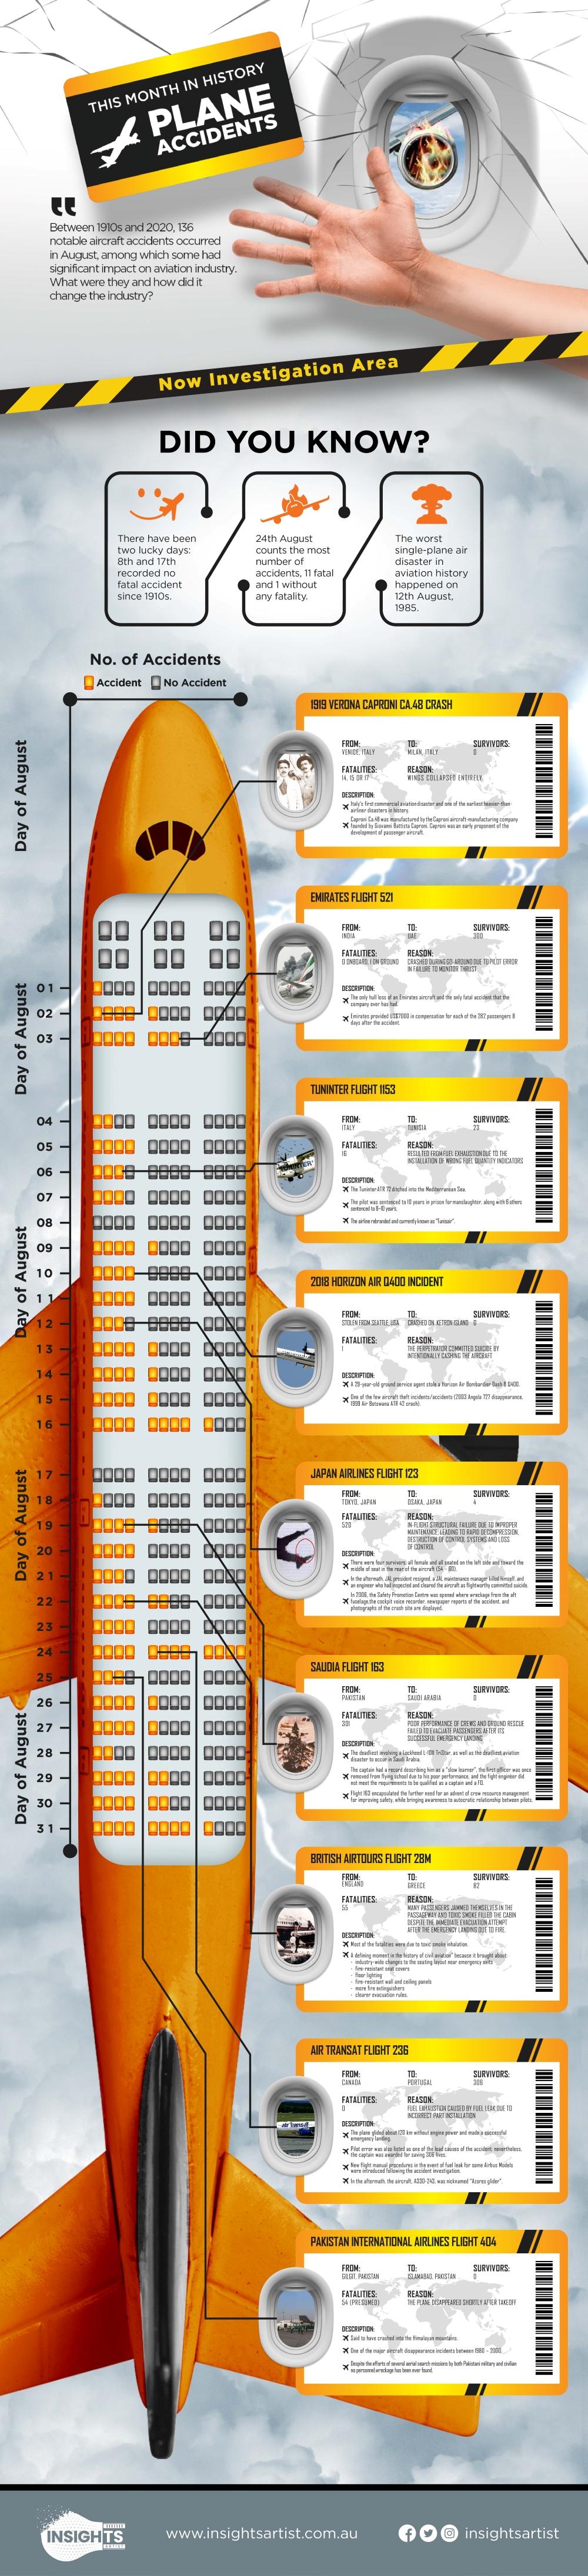 Aircraft Data Infographic